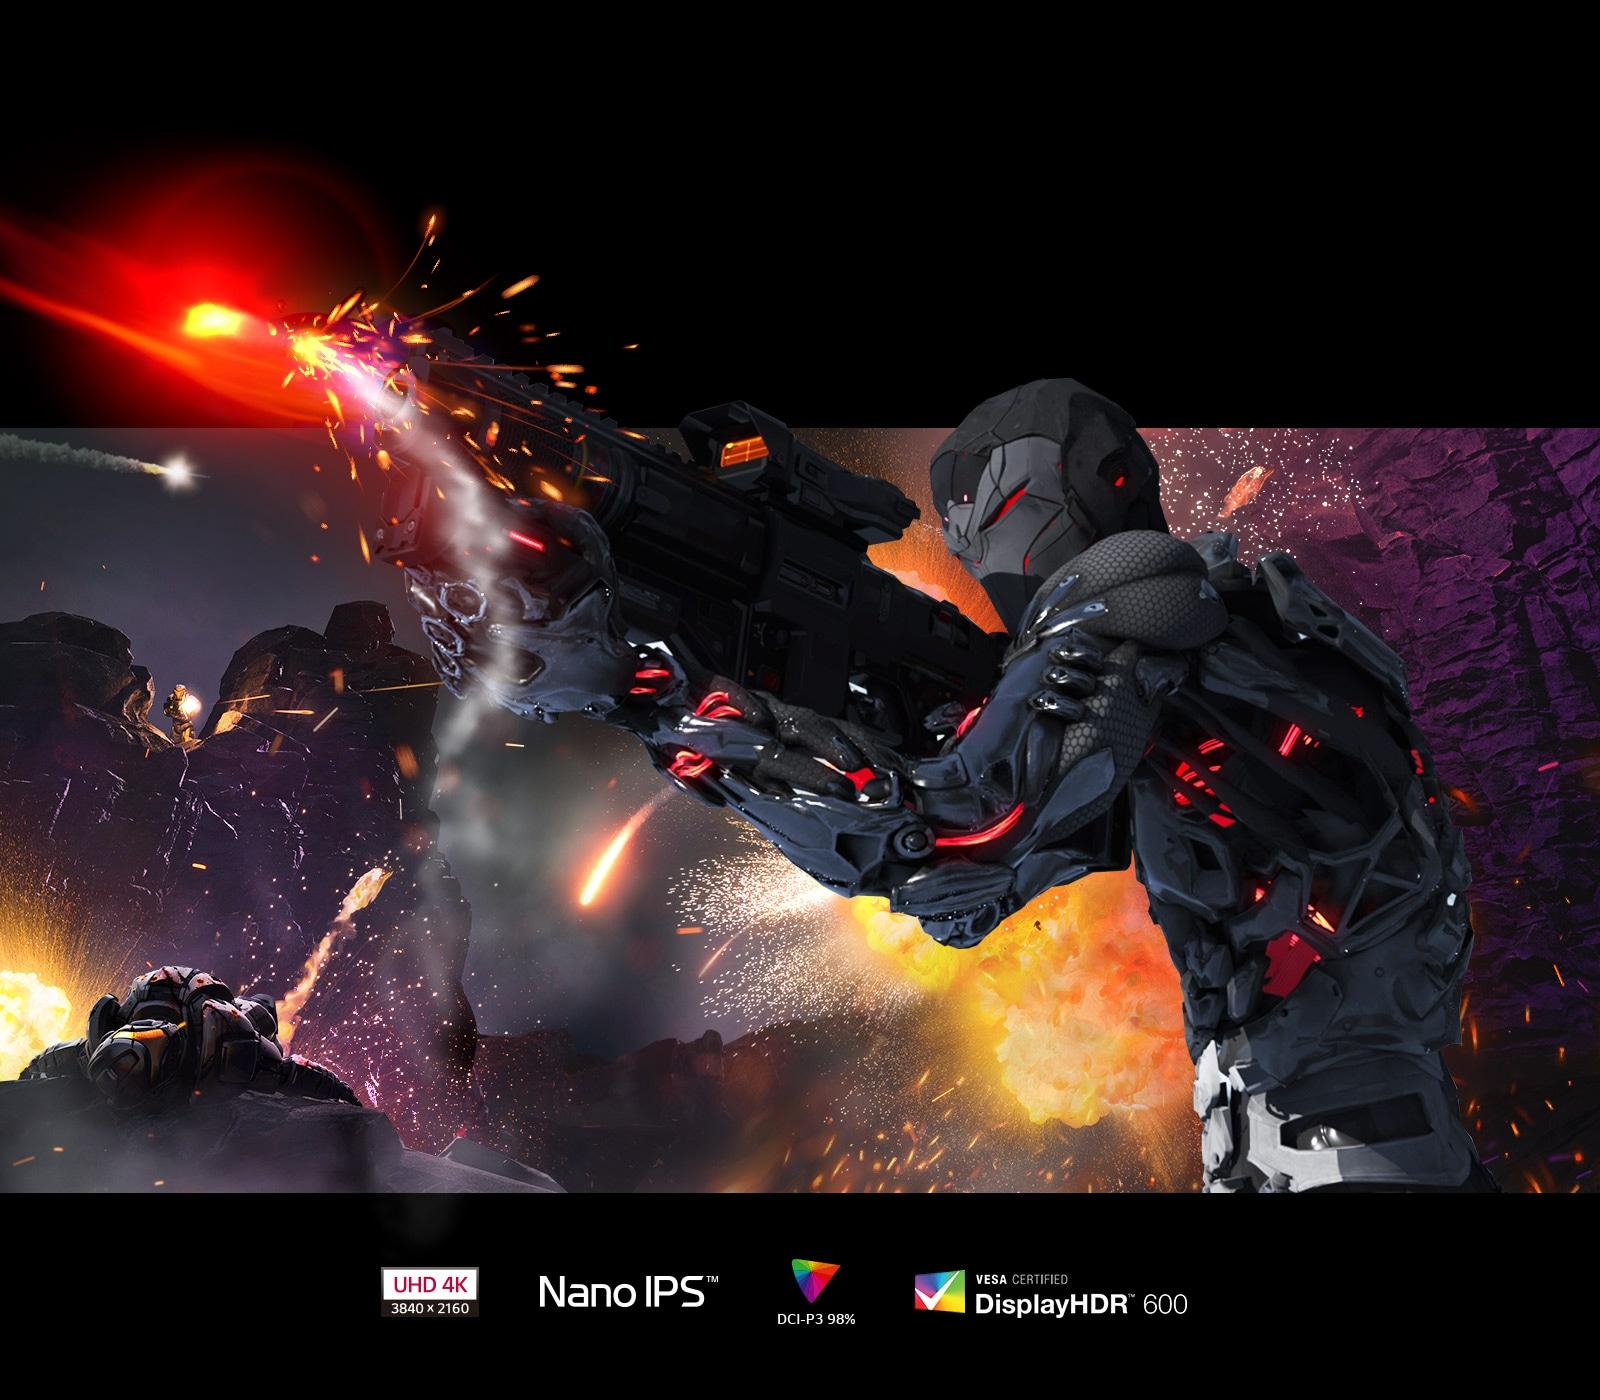 Nano IPS, VESA Display HDR ™ 600 technology provides vibrant colors and details.